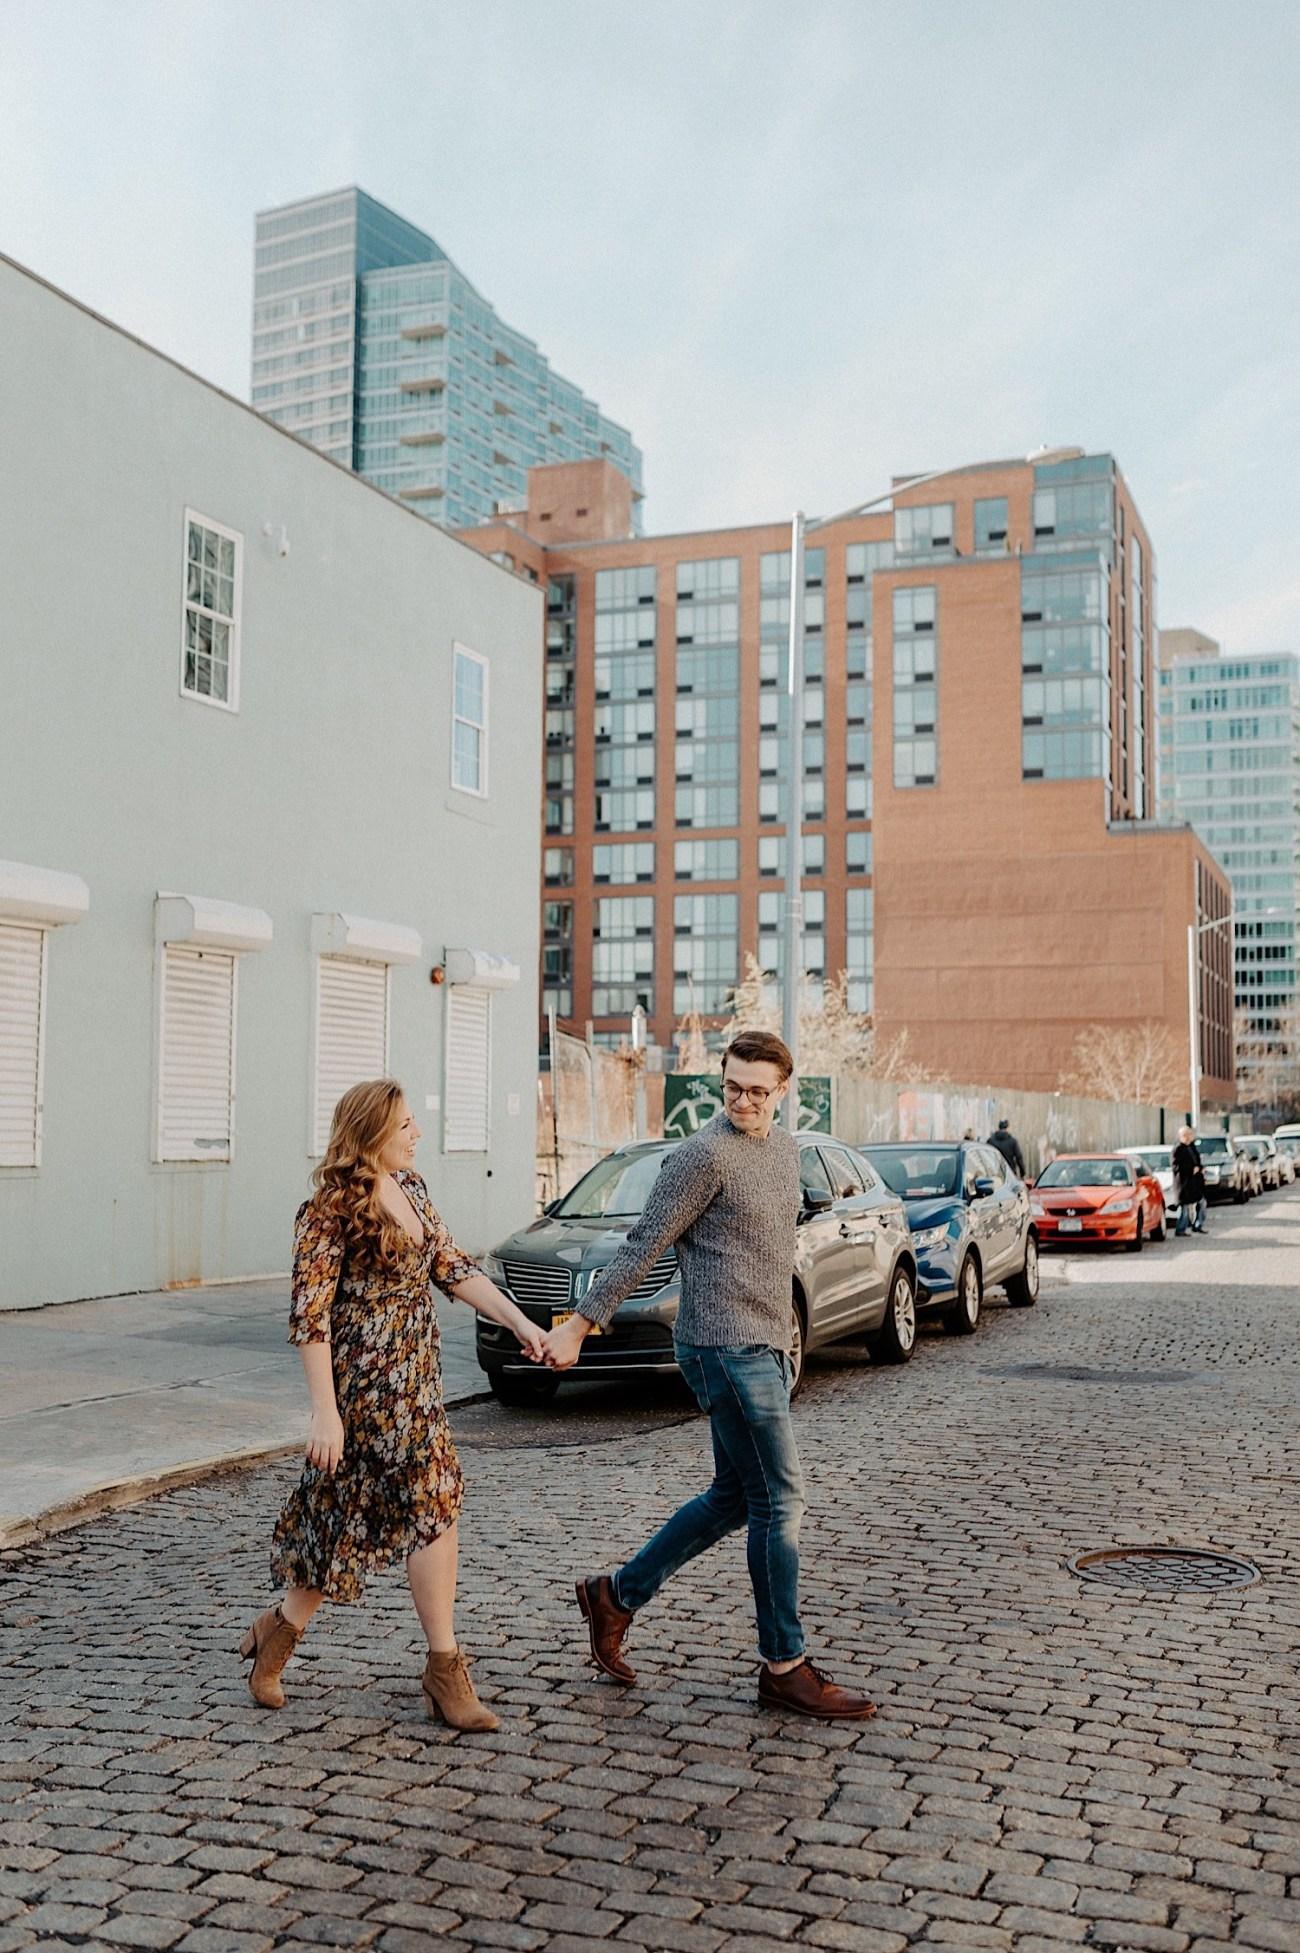 LIC Engagement Photos Pizza Engagement Photos New York Wedding Photographer LIC Boardwalk 008